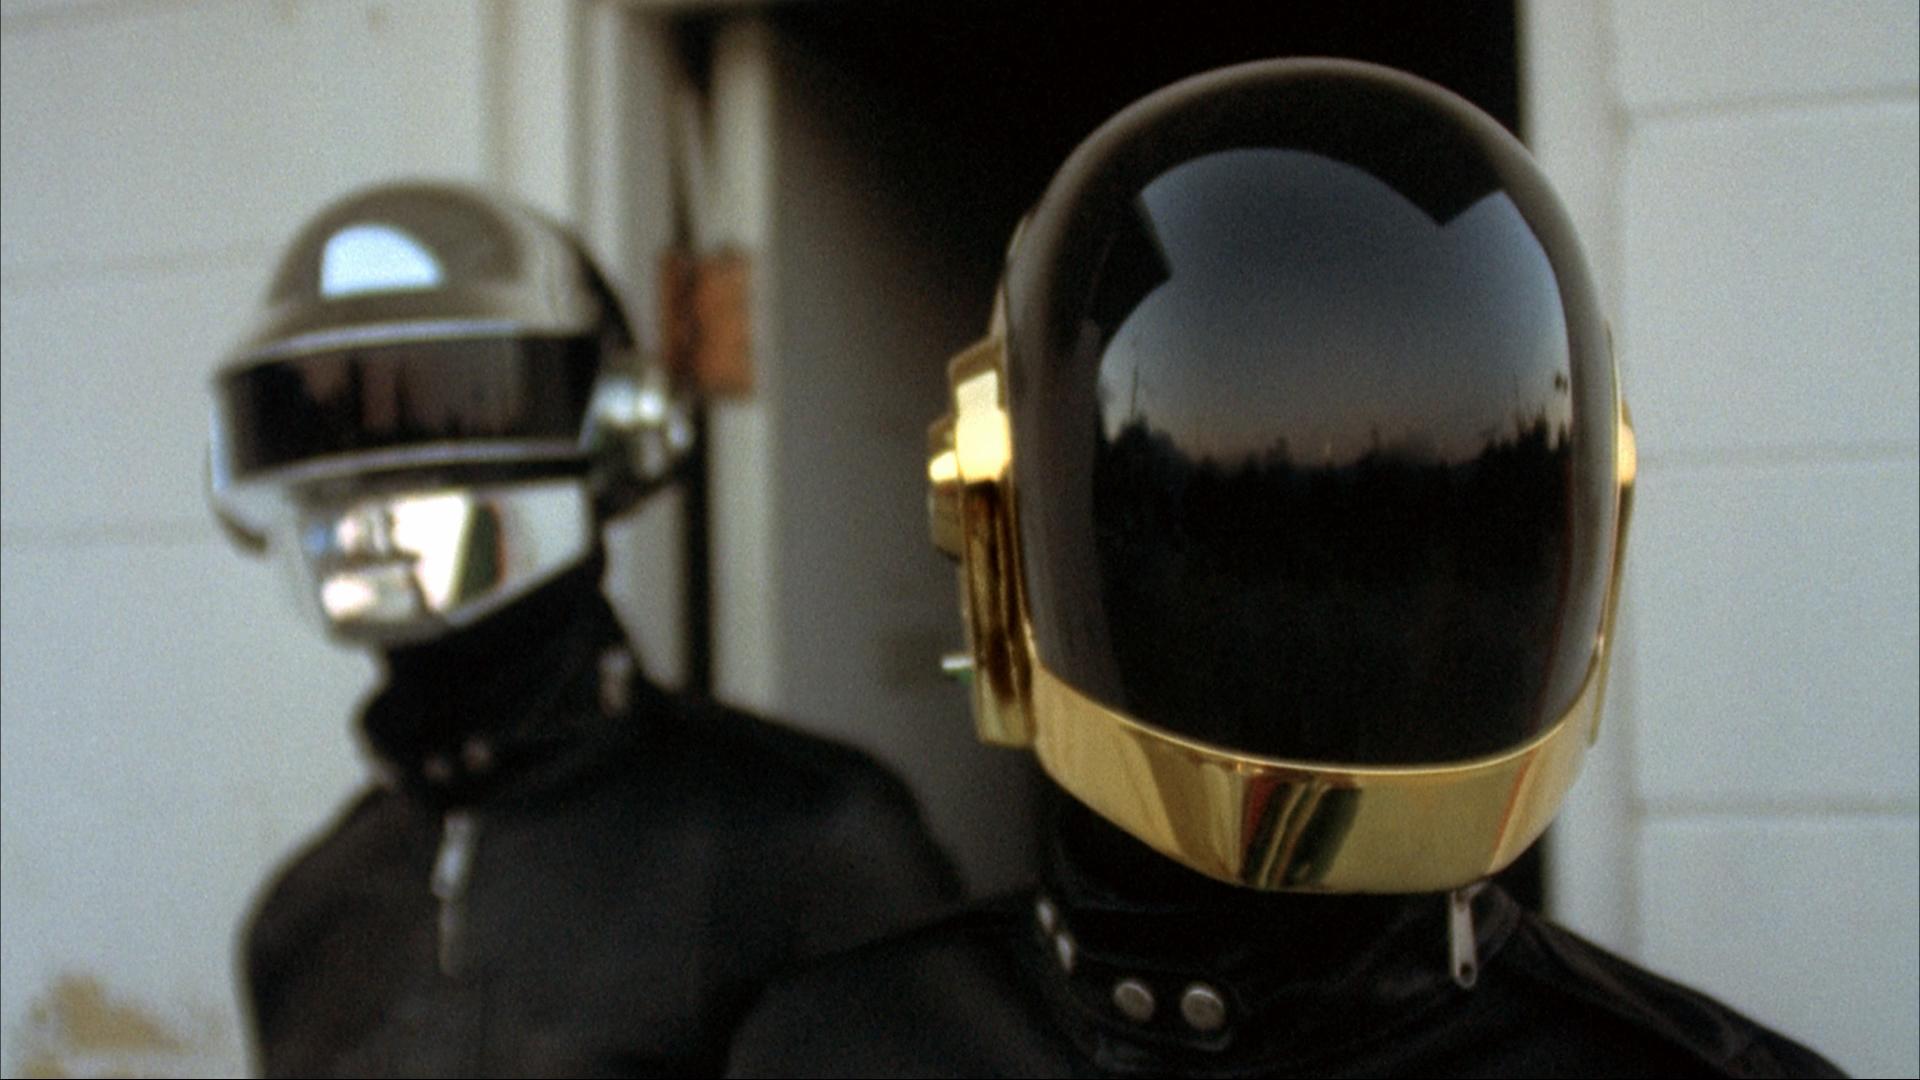 [Jeu] Association d'images - Page 6 Daft-Punk-HD-daft-punk-10709730-1920-1080